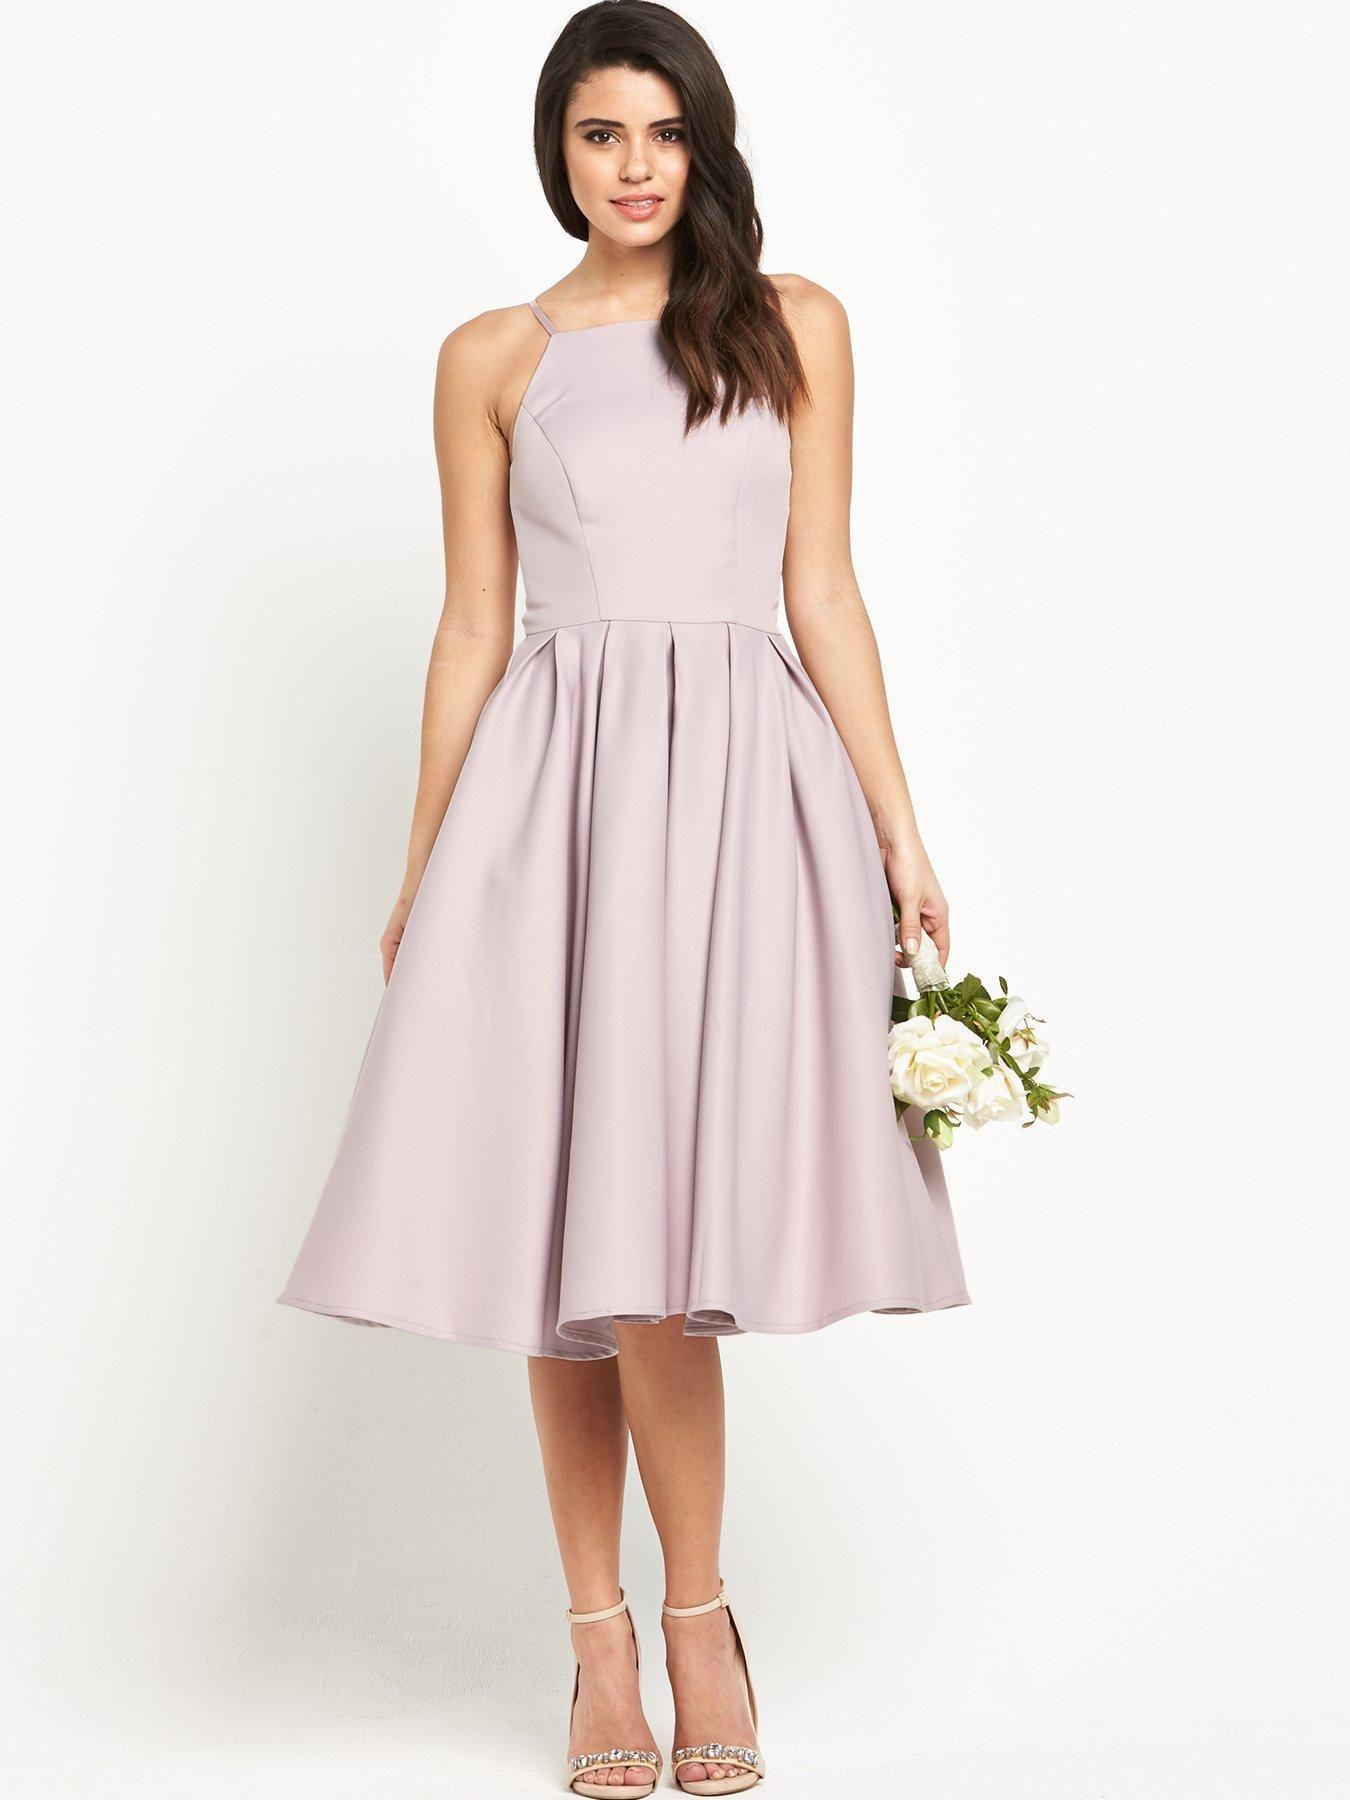 Cream lace and jacquard jewel prom dress